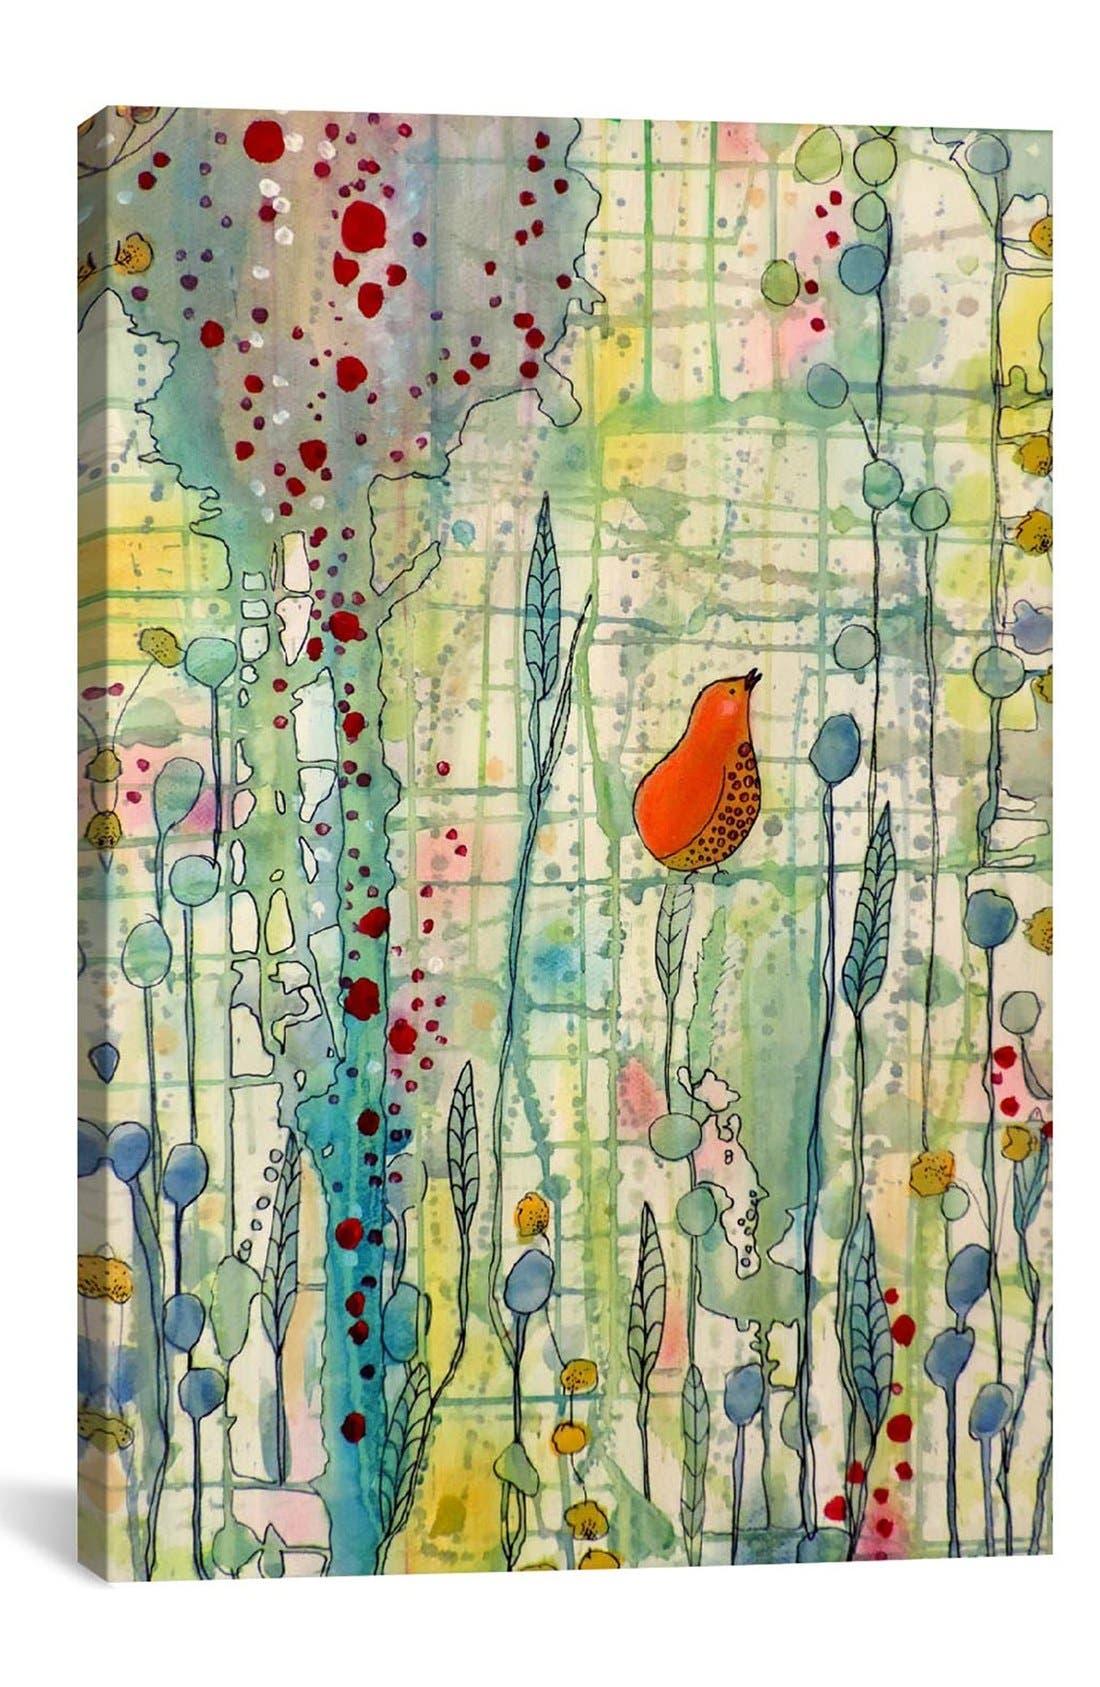 Alternate Image 1 Selected - iCanvas 'Alpha - Sylvie Demers' Giclée Print Canvas Art